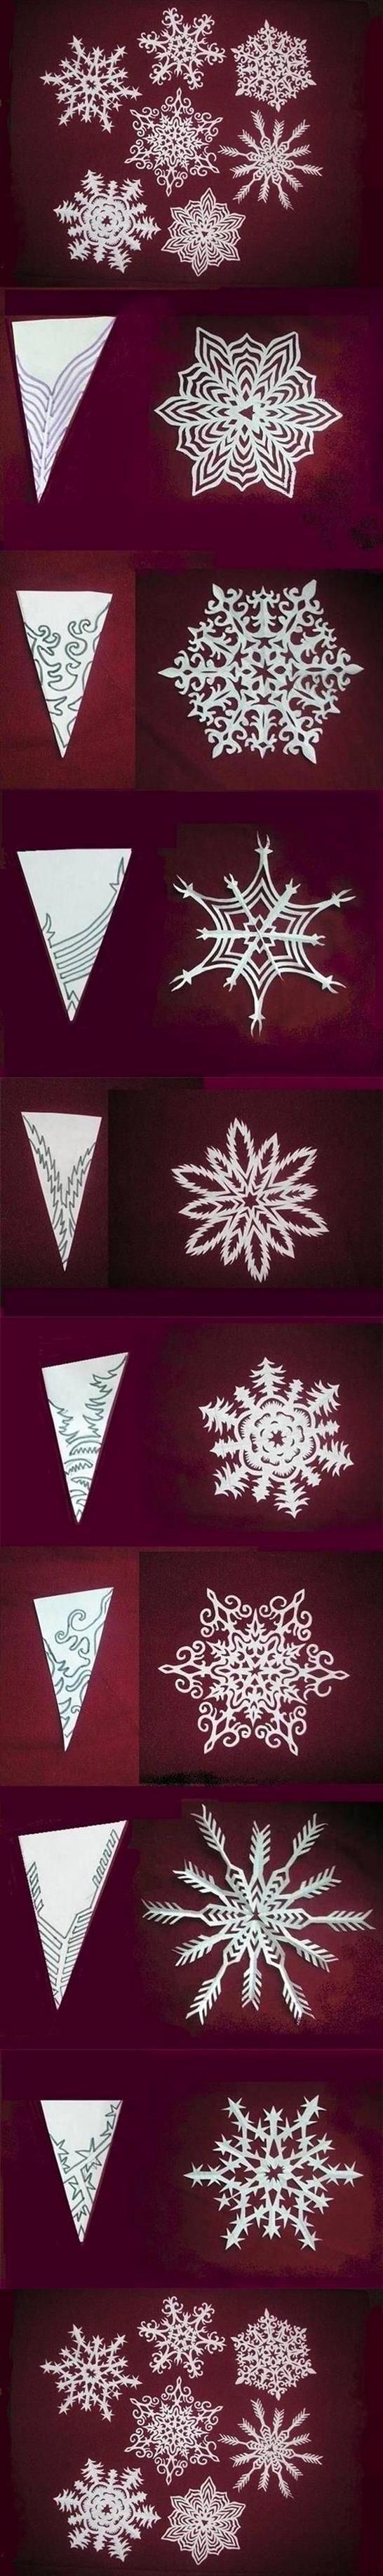 snowflakes diy | snowflakes diy template | snowflakes diy paper | snowflakes diy kids | snowflakes diy easy | Snowflakes, DIY, bead, paper, crochet | Snowflakes (DIY) | Snowflakes DIY |